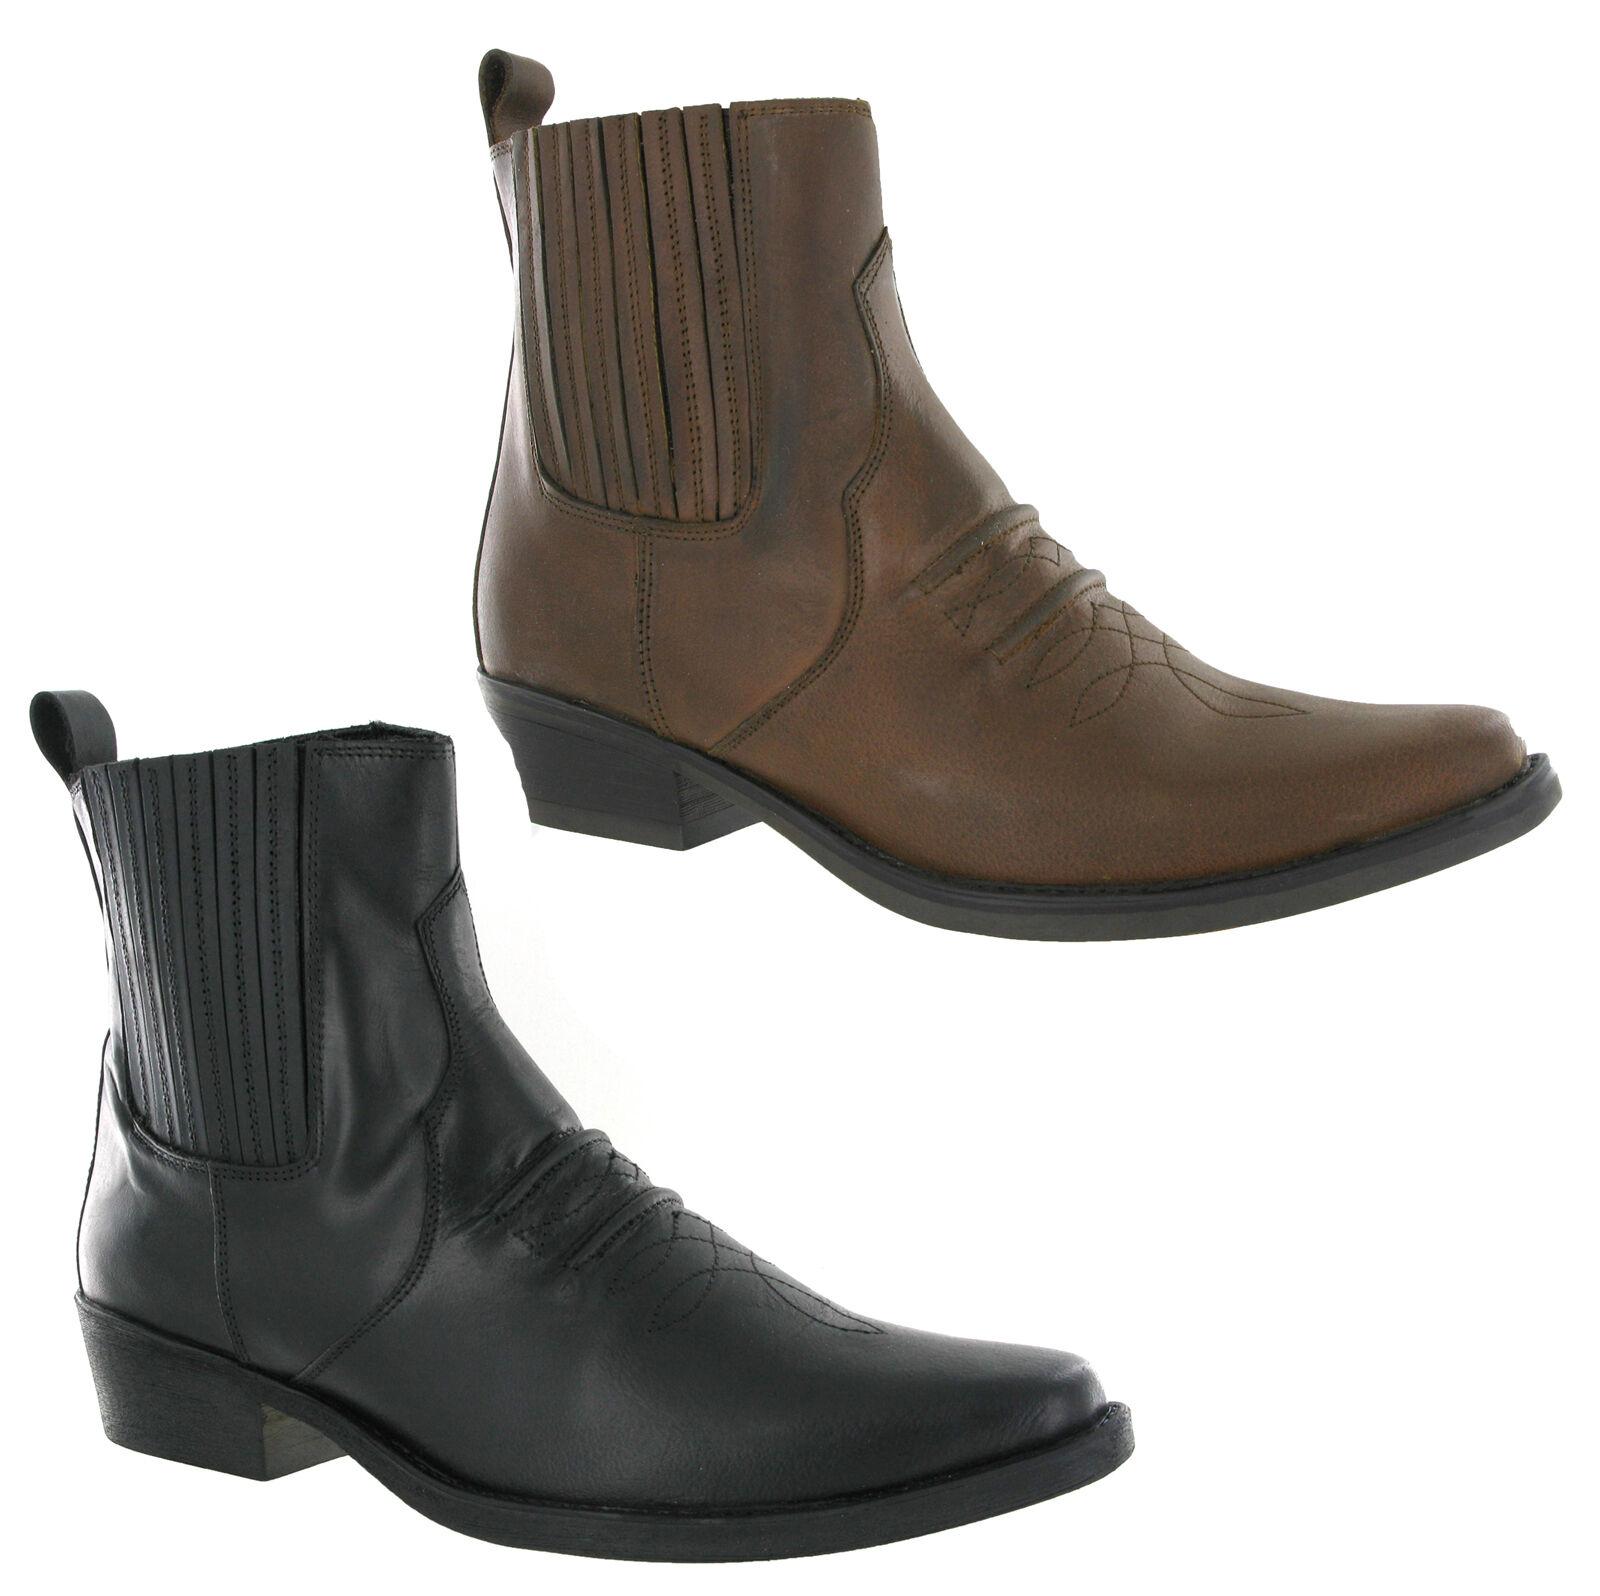 7ece08efa513 Gringos Zwickel Cowboy Western Herren Leder Stiefeletten UK6-12   eBay